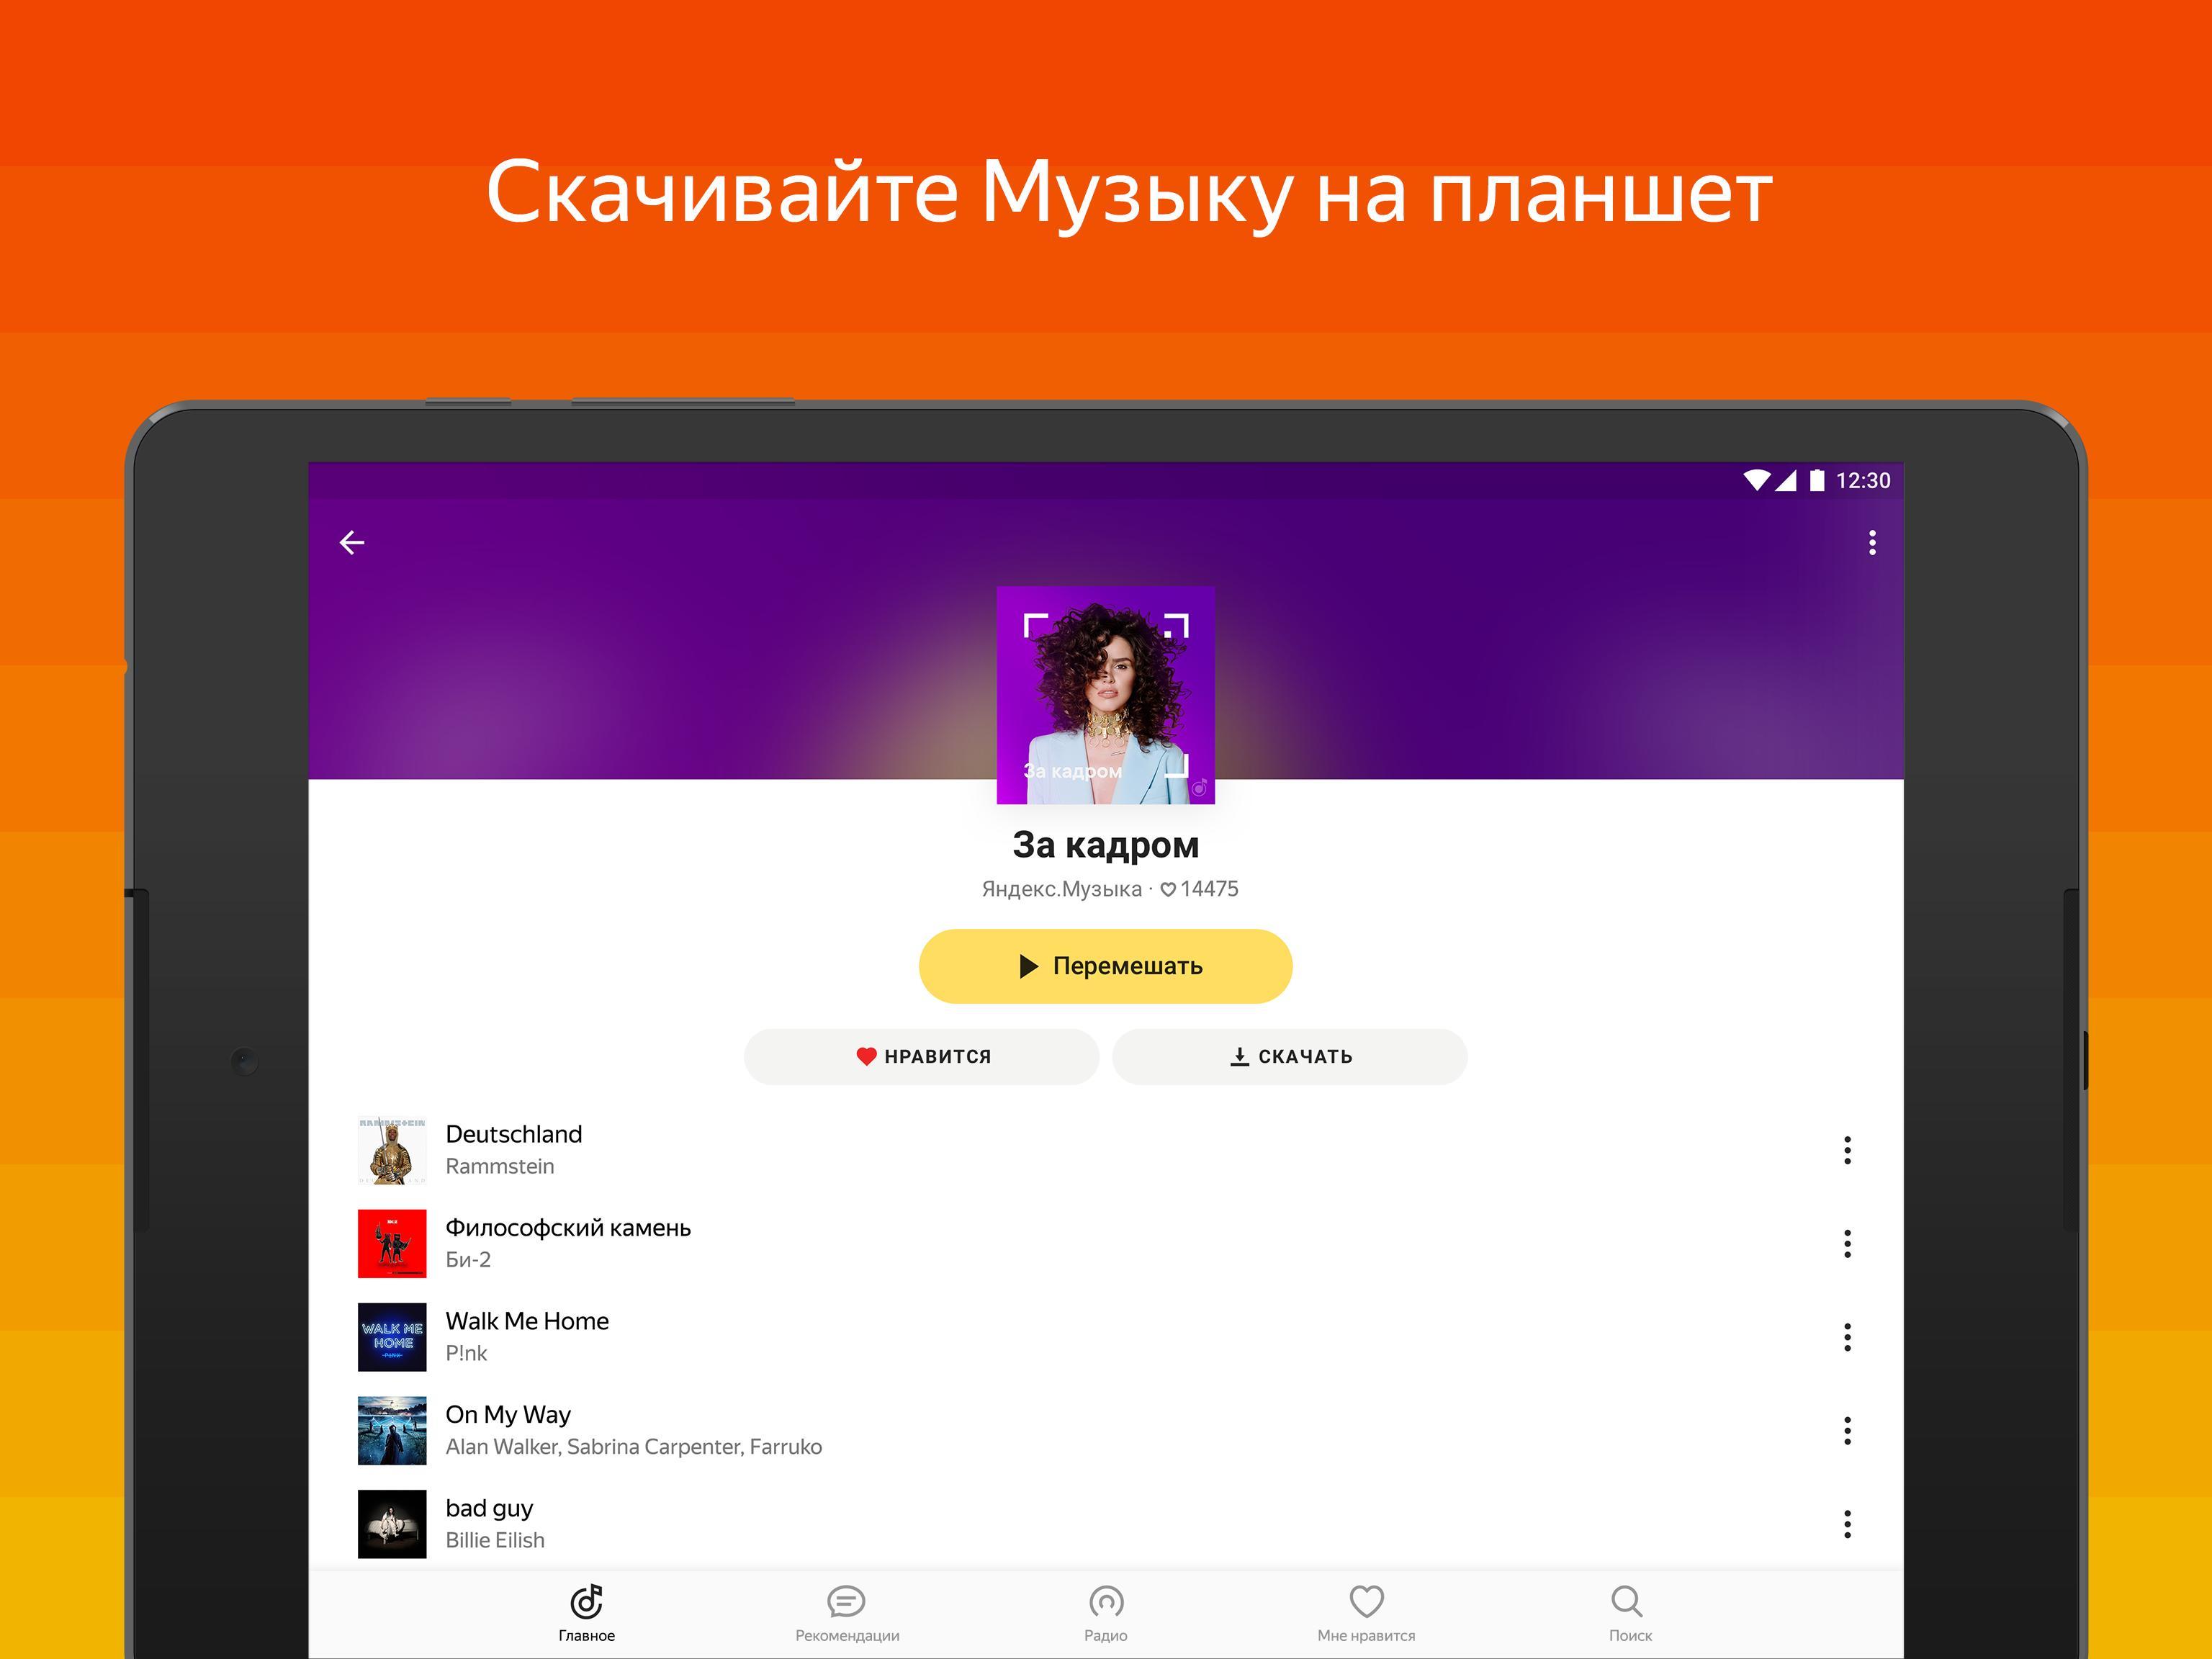 официальный сайт азино777 яндекс музыка